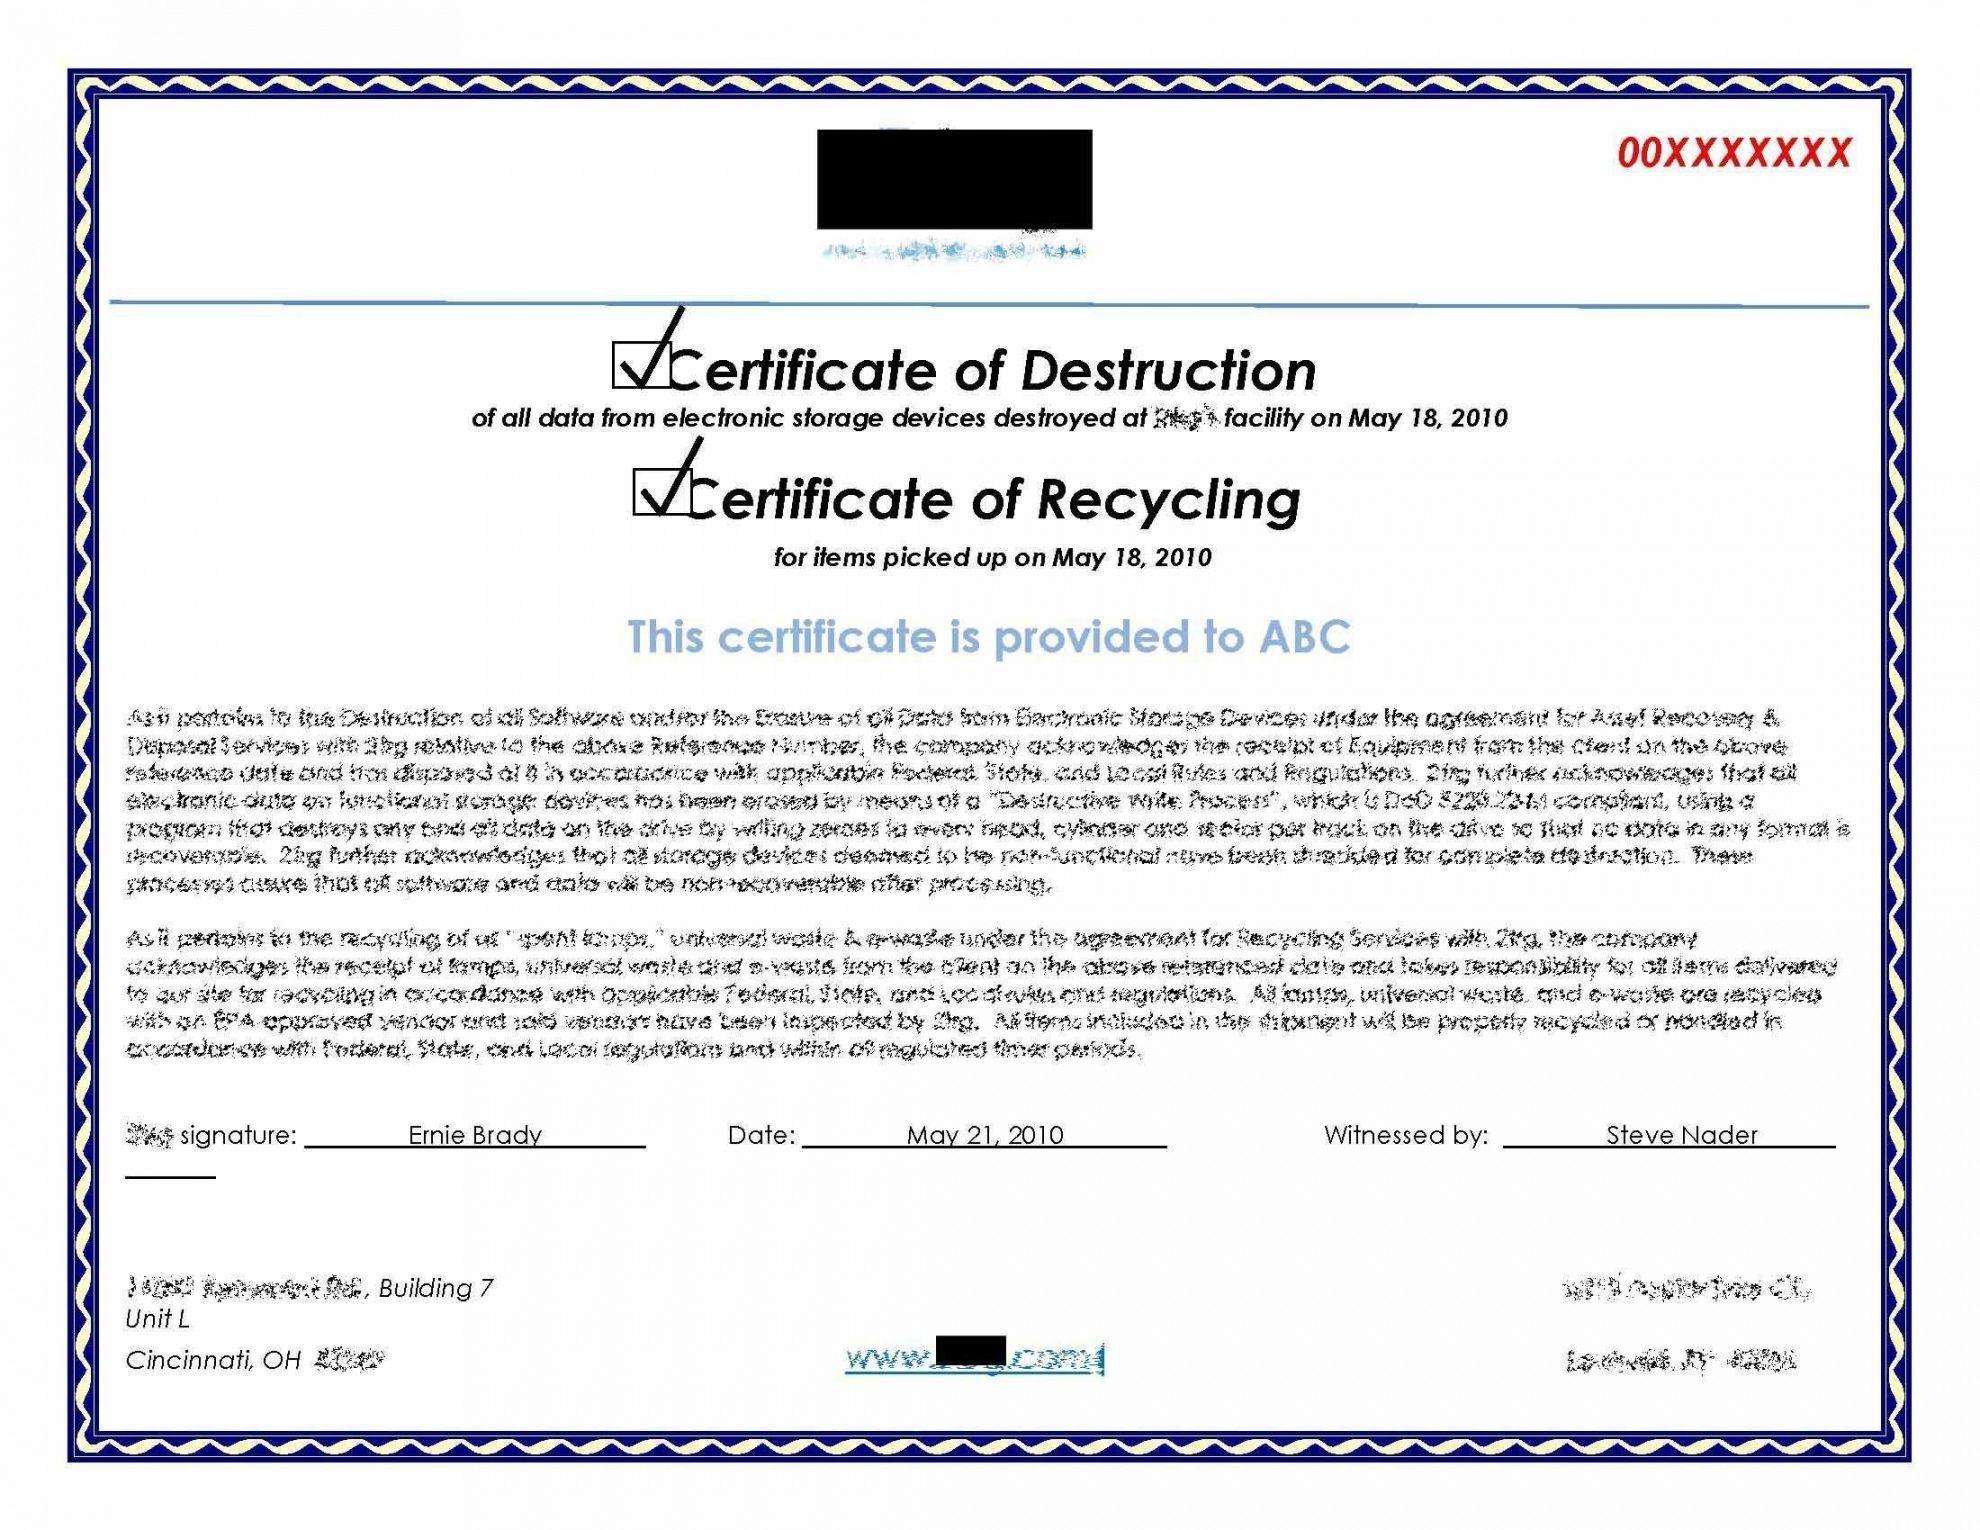 certificate destruction template drive hard templates sample printable certificates emetonlineblog pejuang editable admin